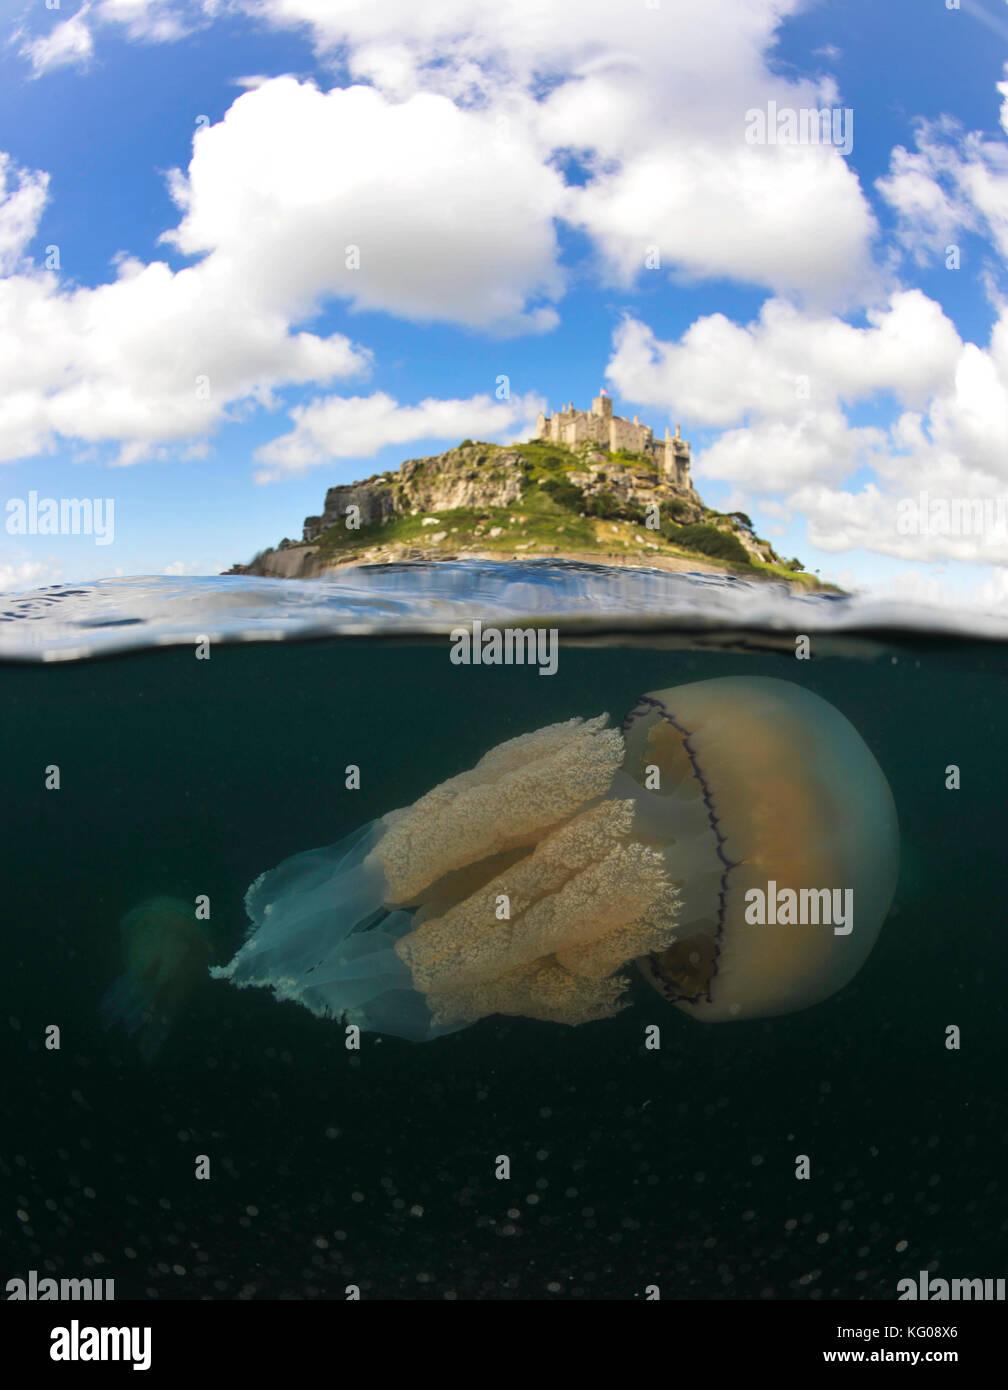 Barrel Jellyfish - Stock Image